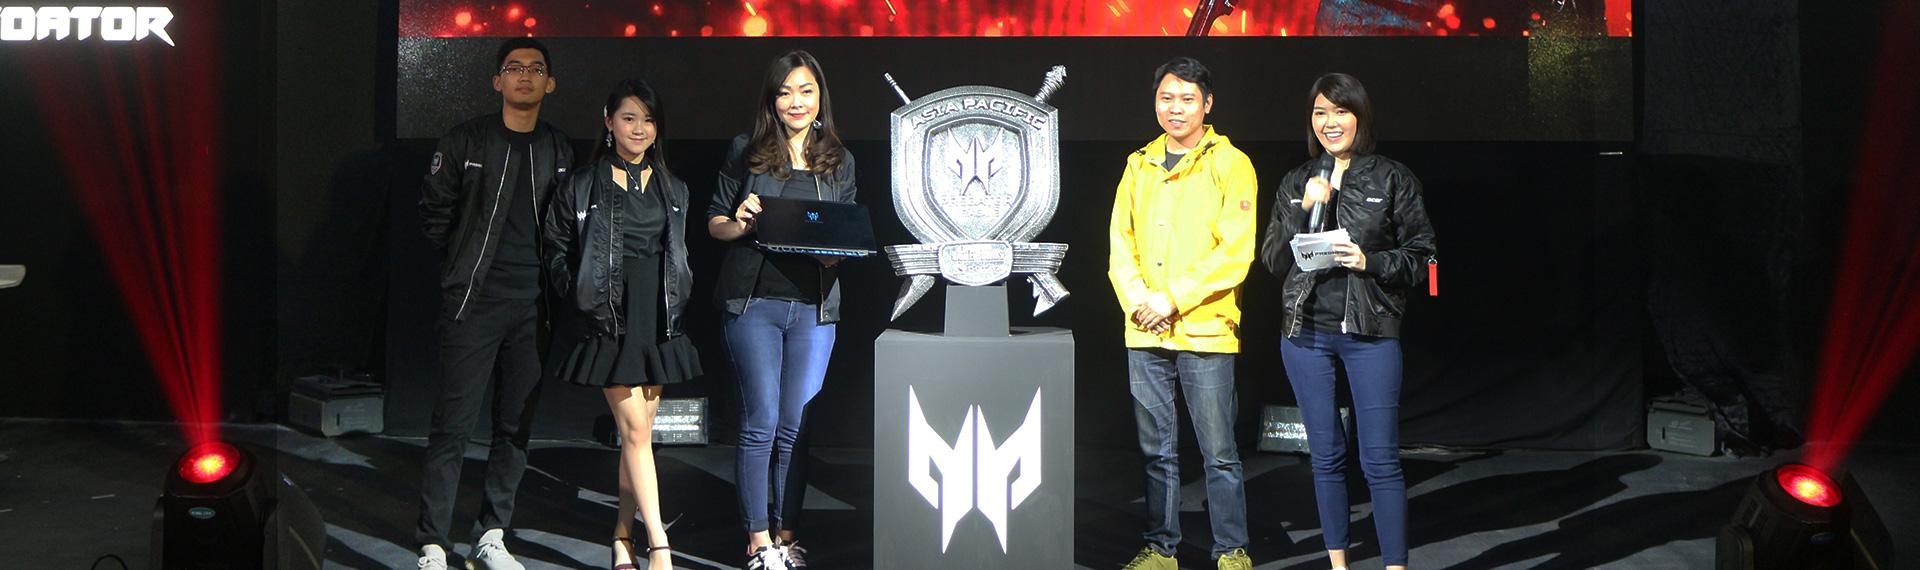 Asia Pacific Predator League 2020, Ajang Esports yang Semakin Mendunia